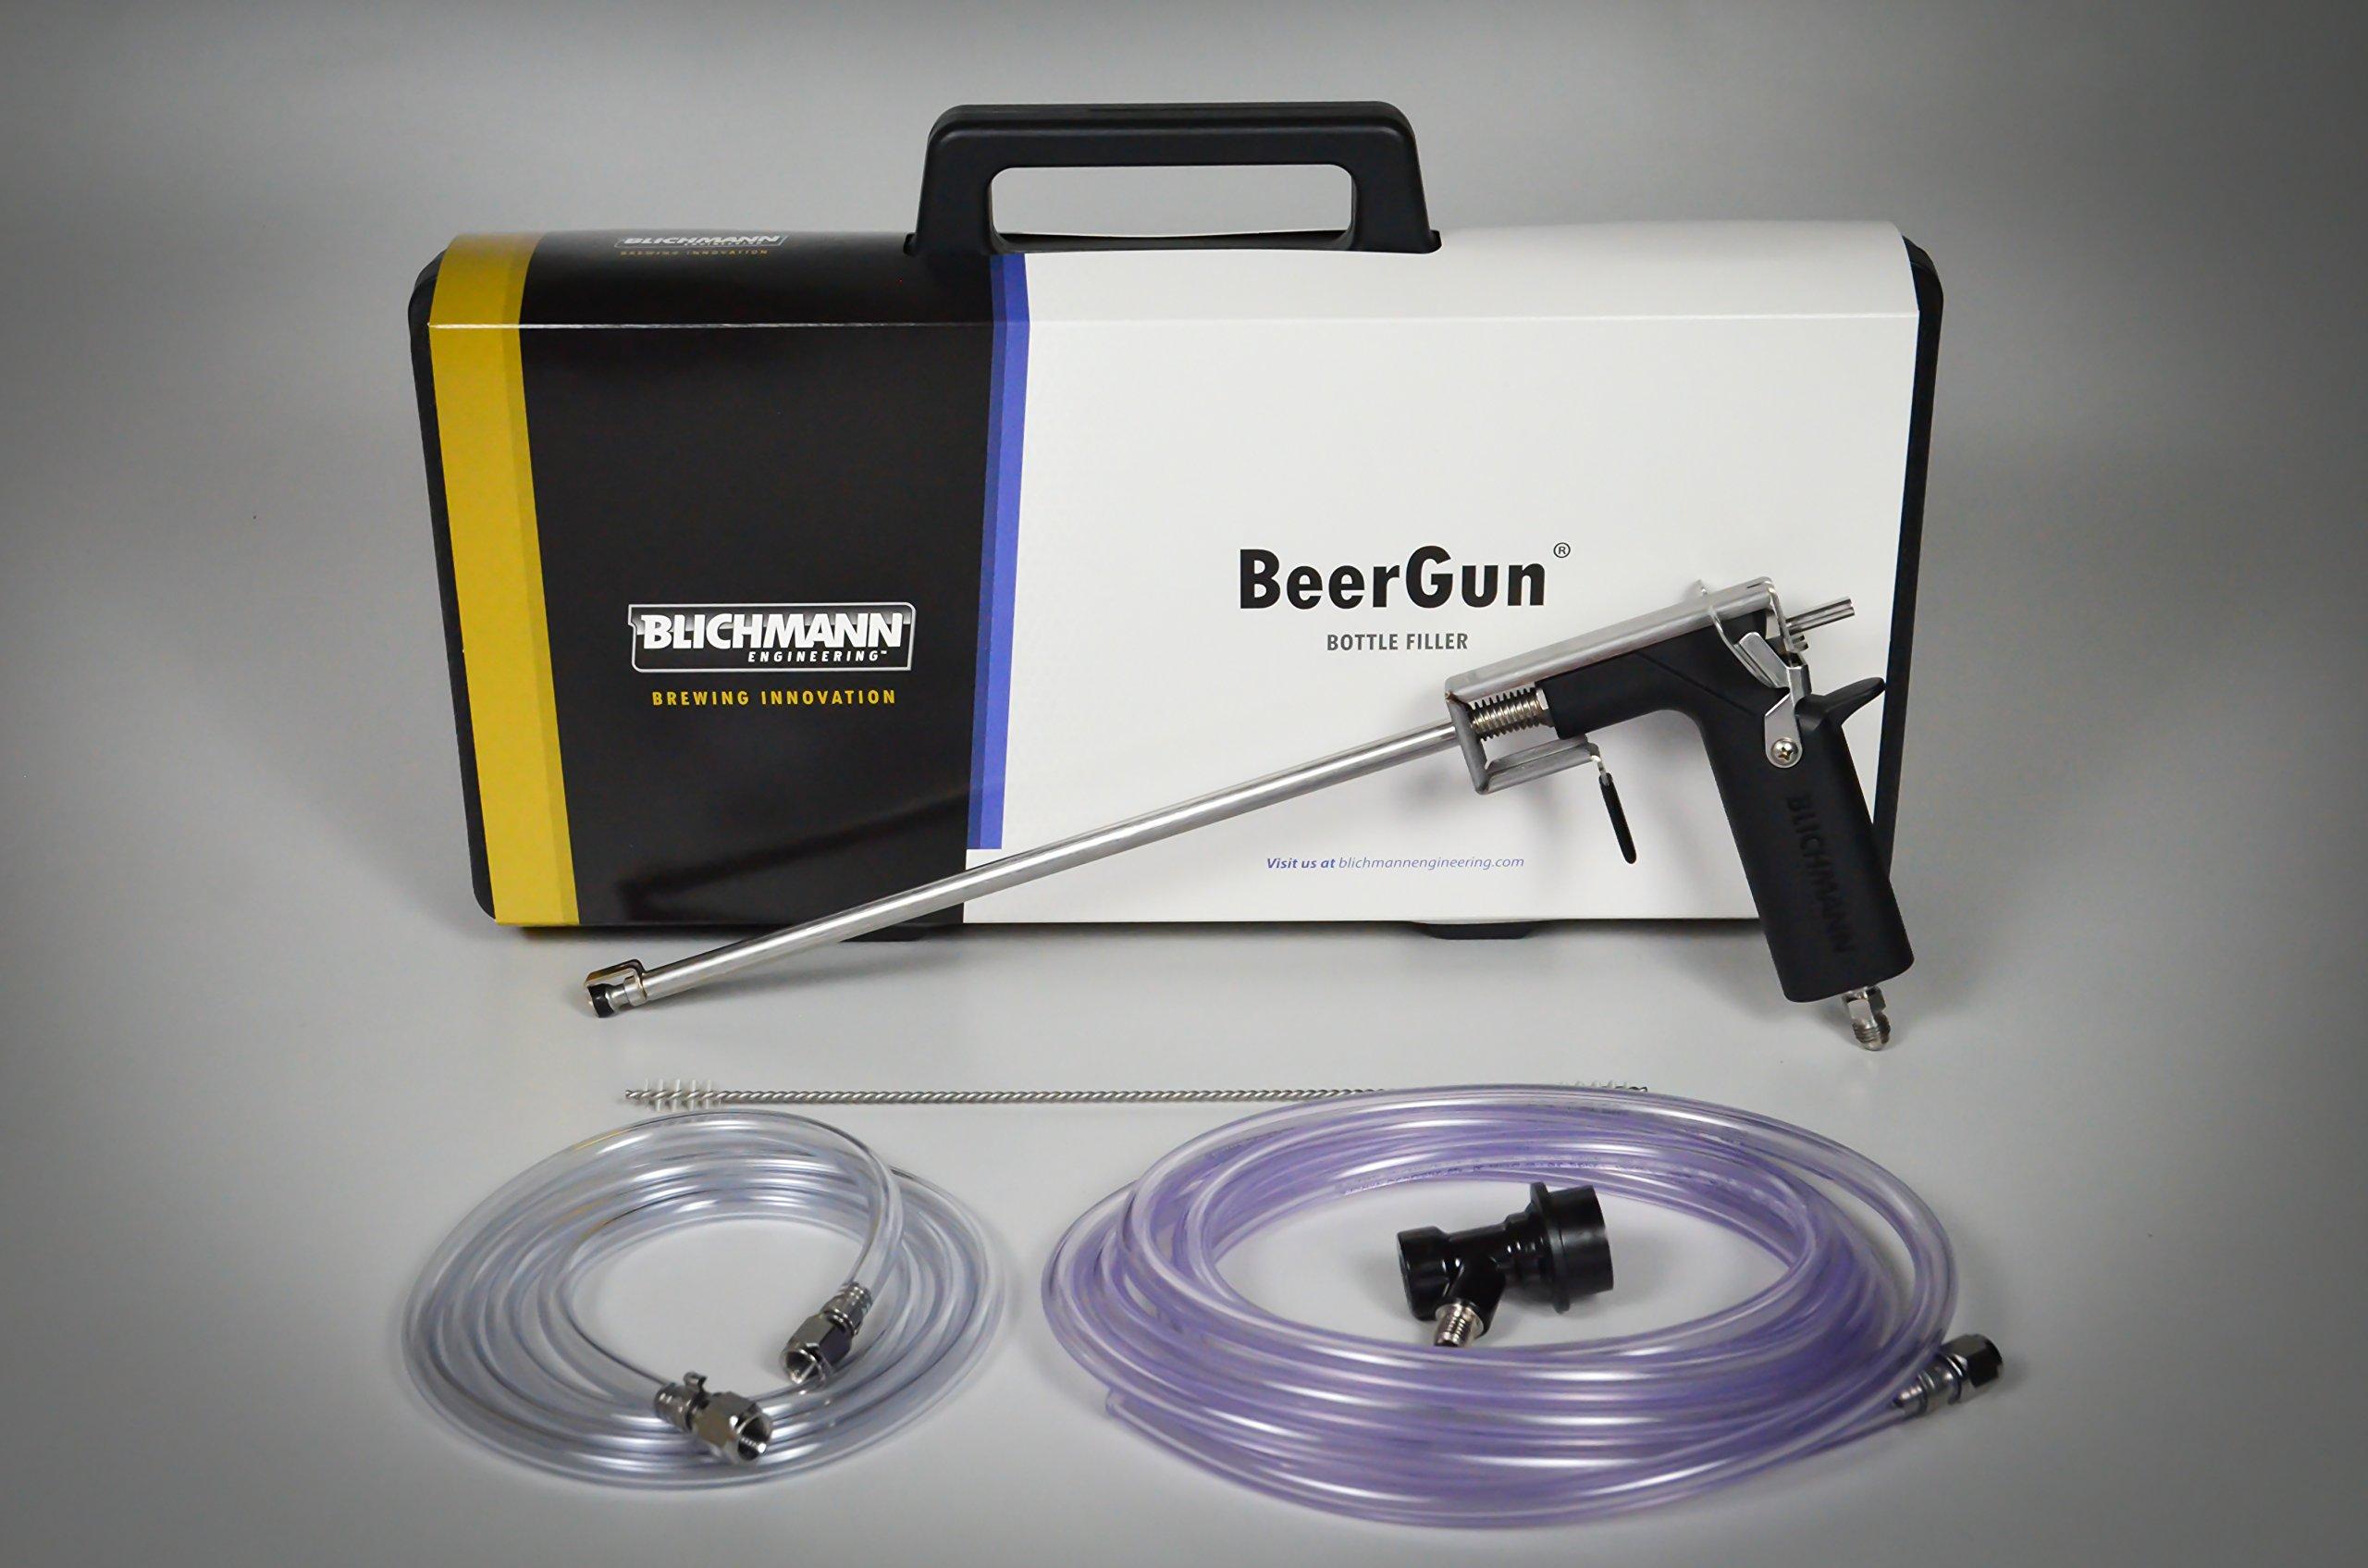 Blichmann BeerGun Stainless Bottle Filler & Accessory Kit by Blichmann Engineering